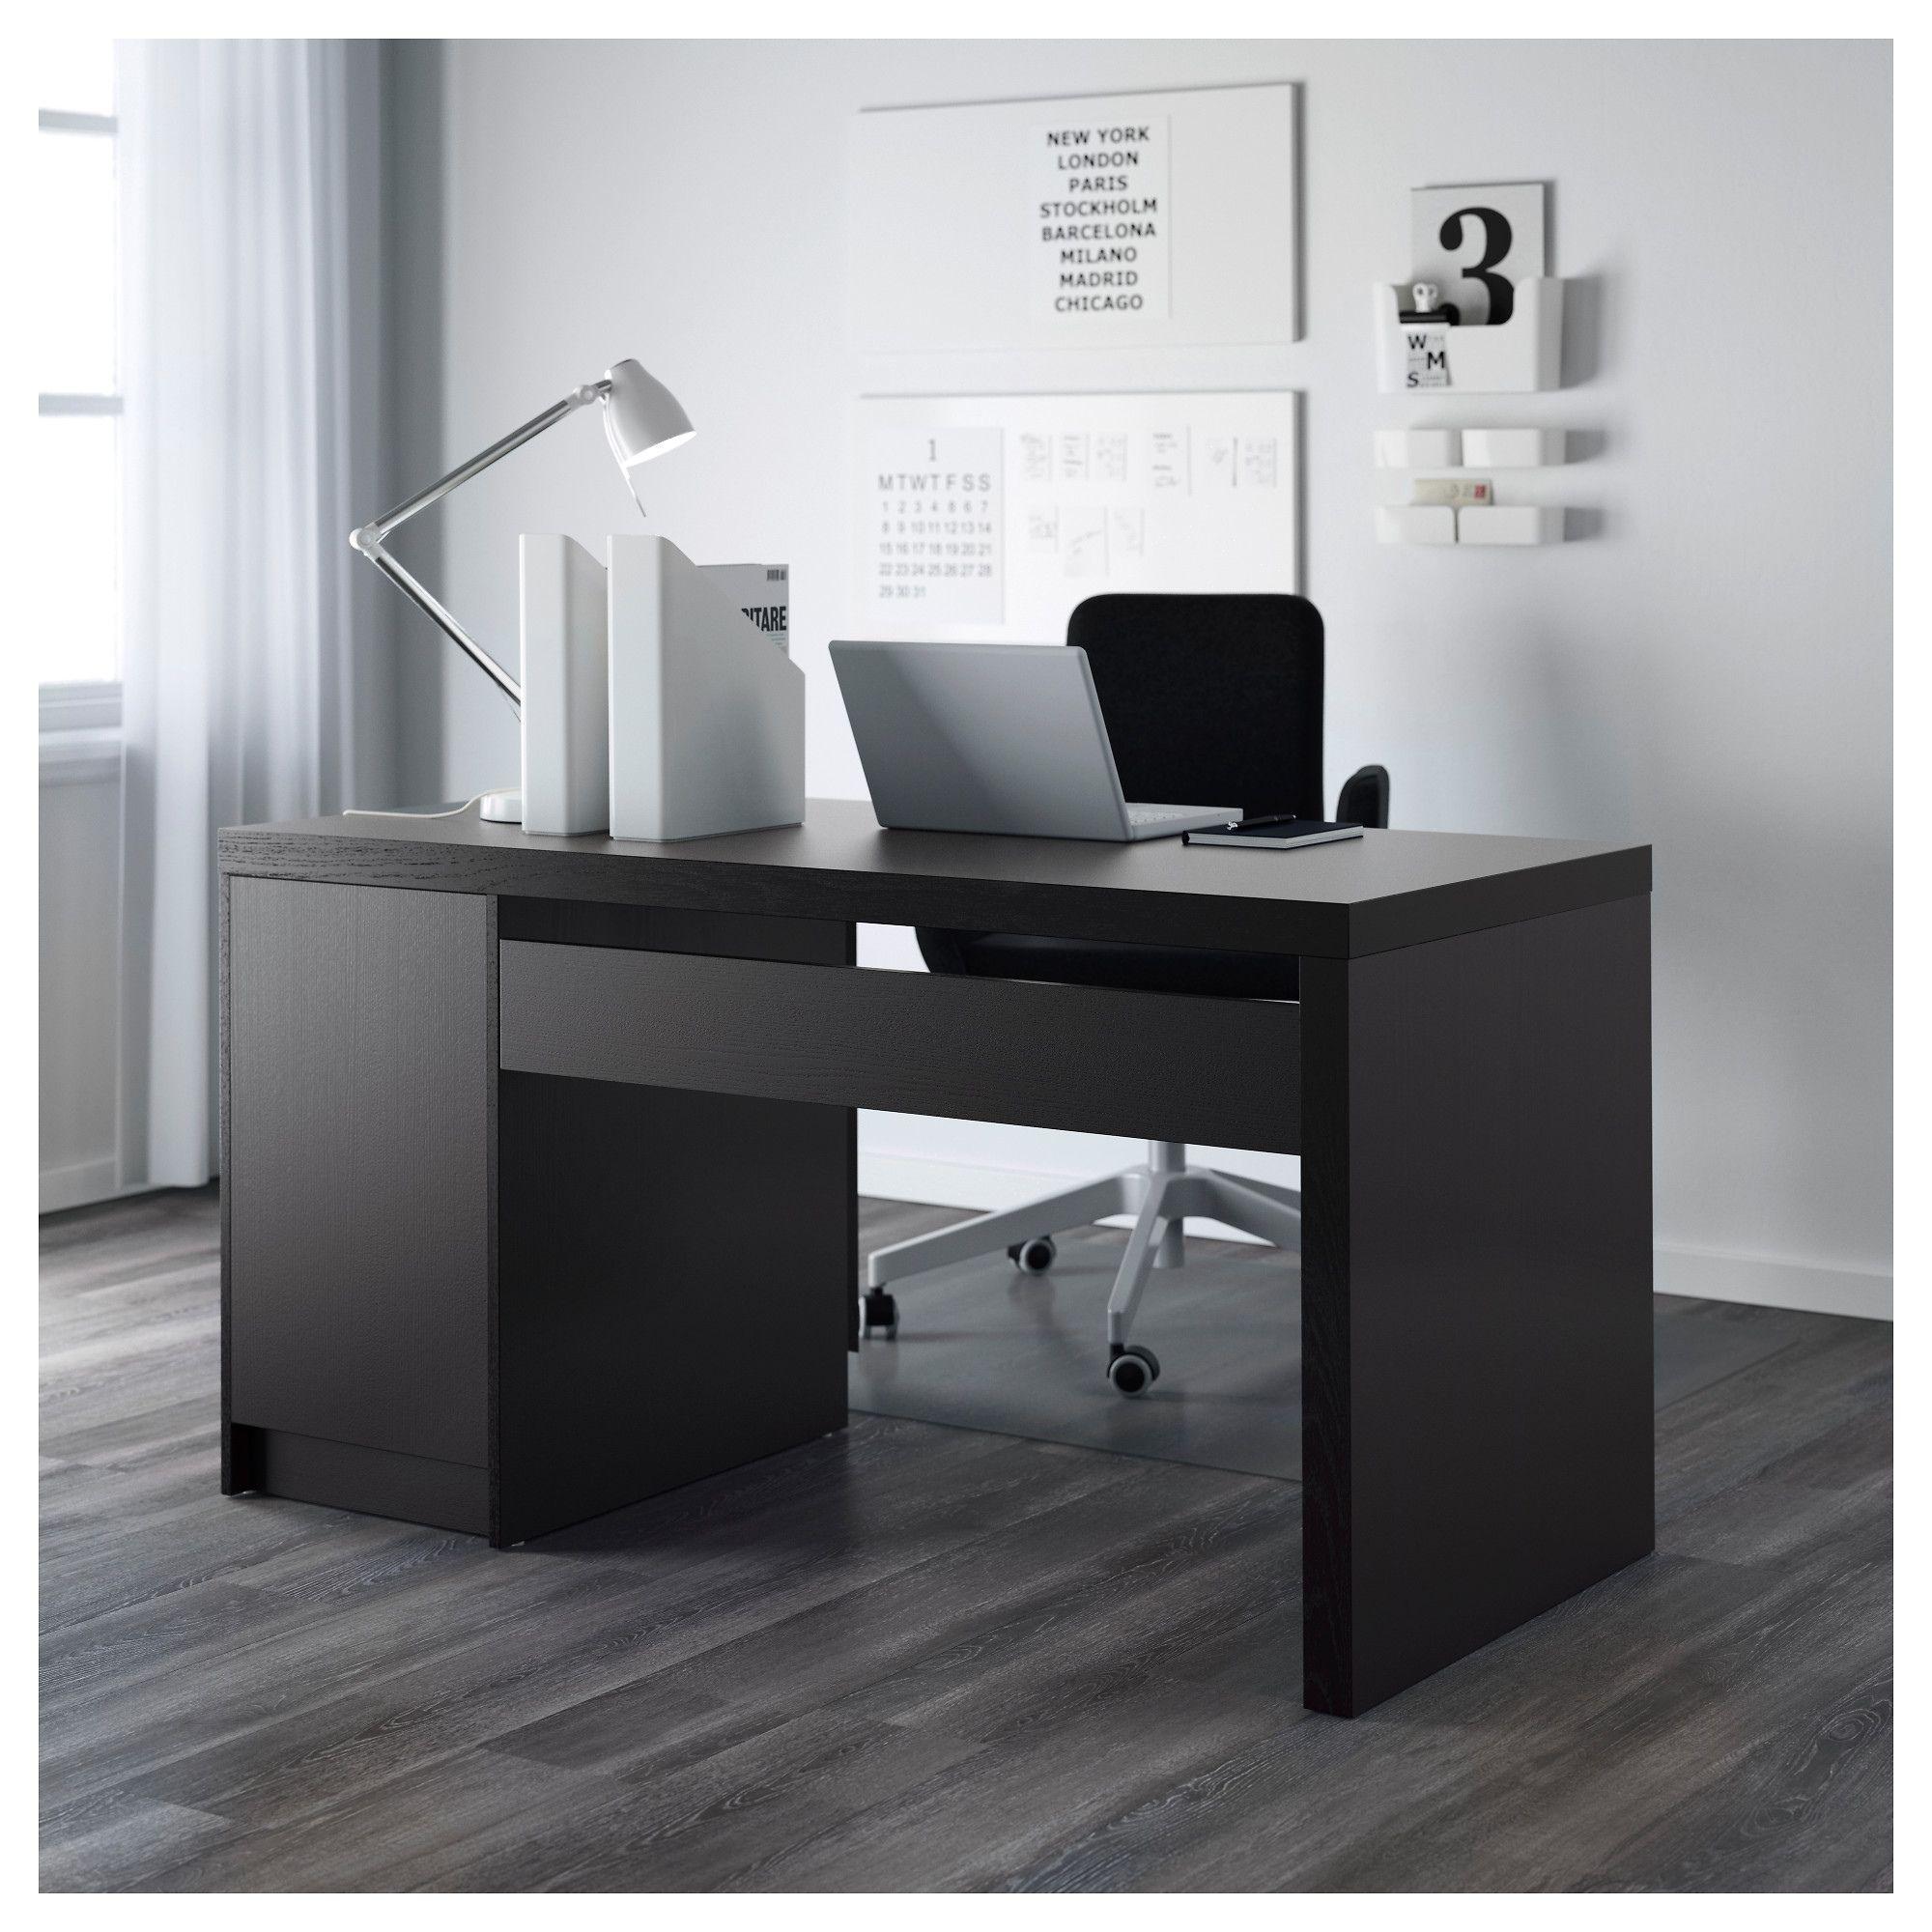 white office desk ikea. Ikea Malm White Office Desk - Best Ergonomic Chair Check More At Http://www.sewcraftyjenn.com/ikea-malm-white-office-desk/ T